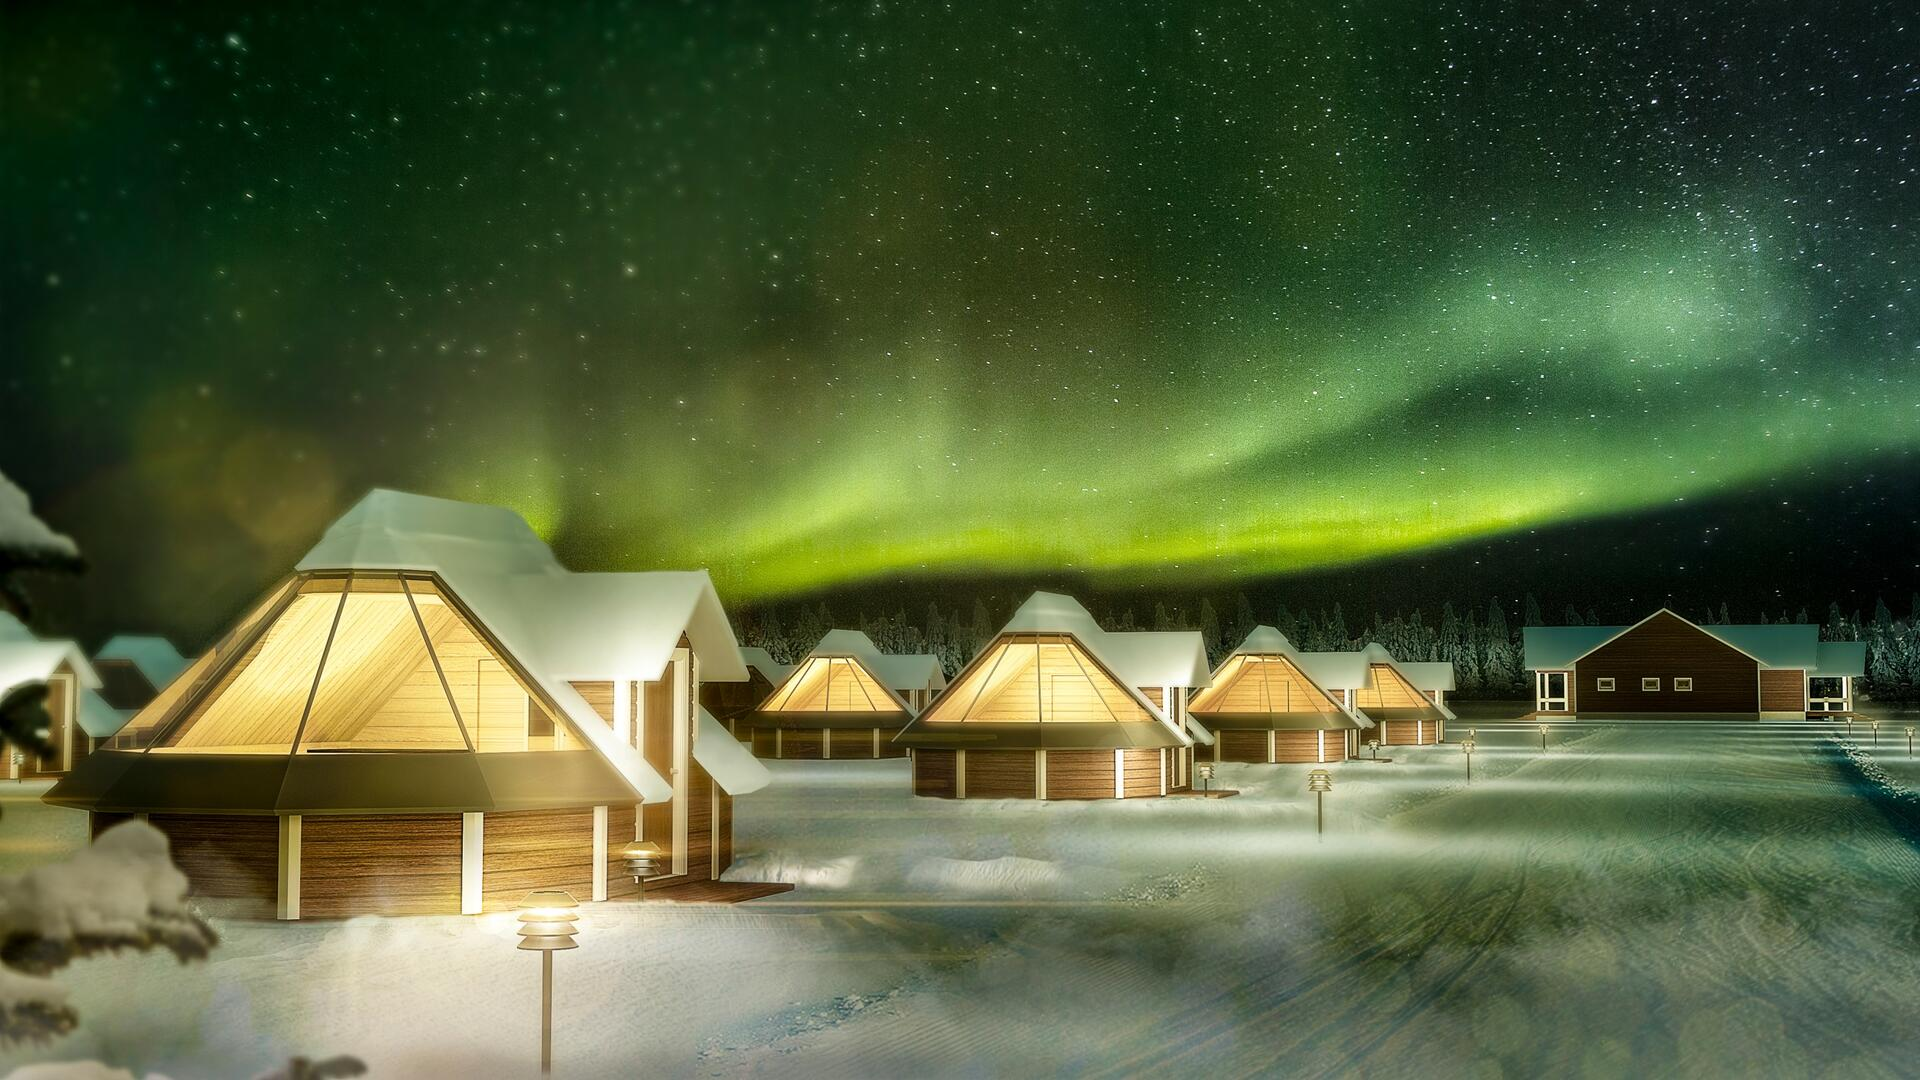 Cabins at Northern Lights Village Levi in Sirkka, Finland